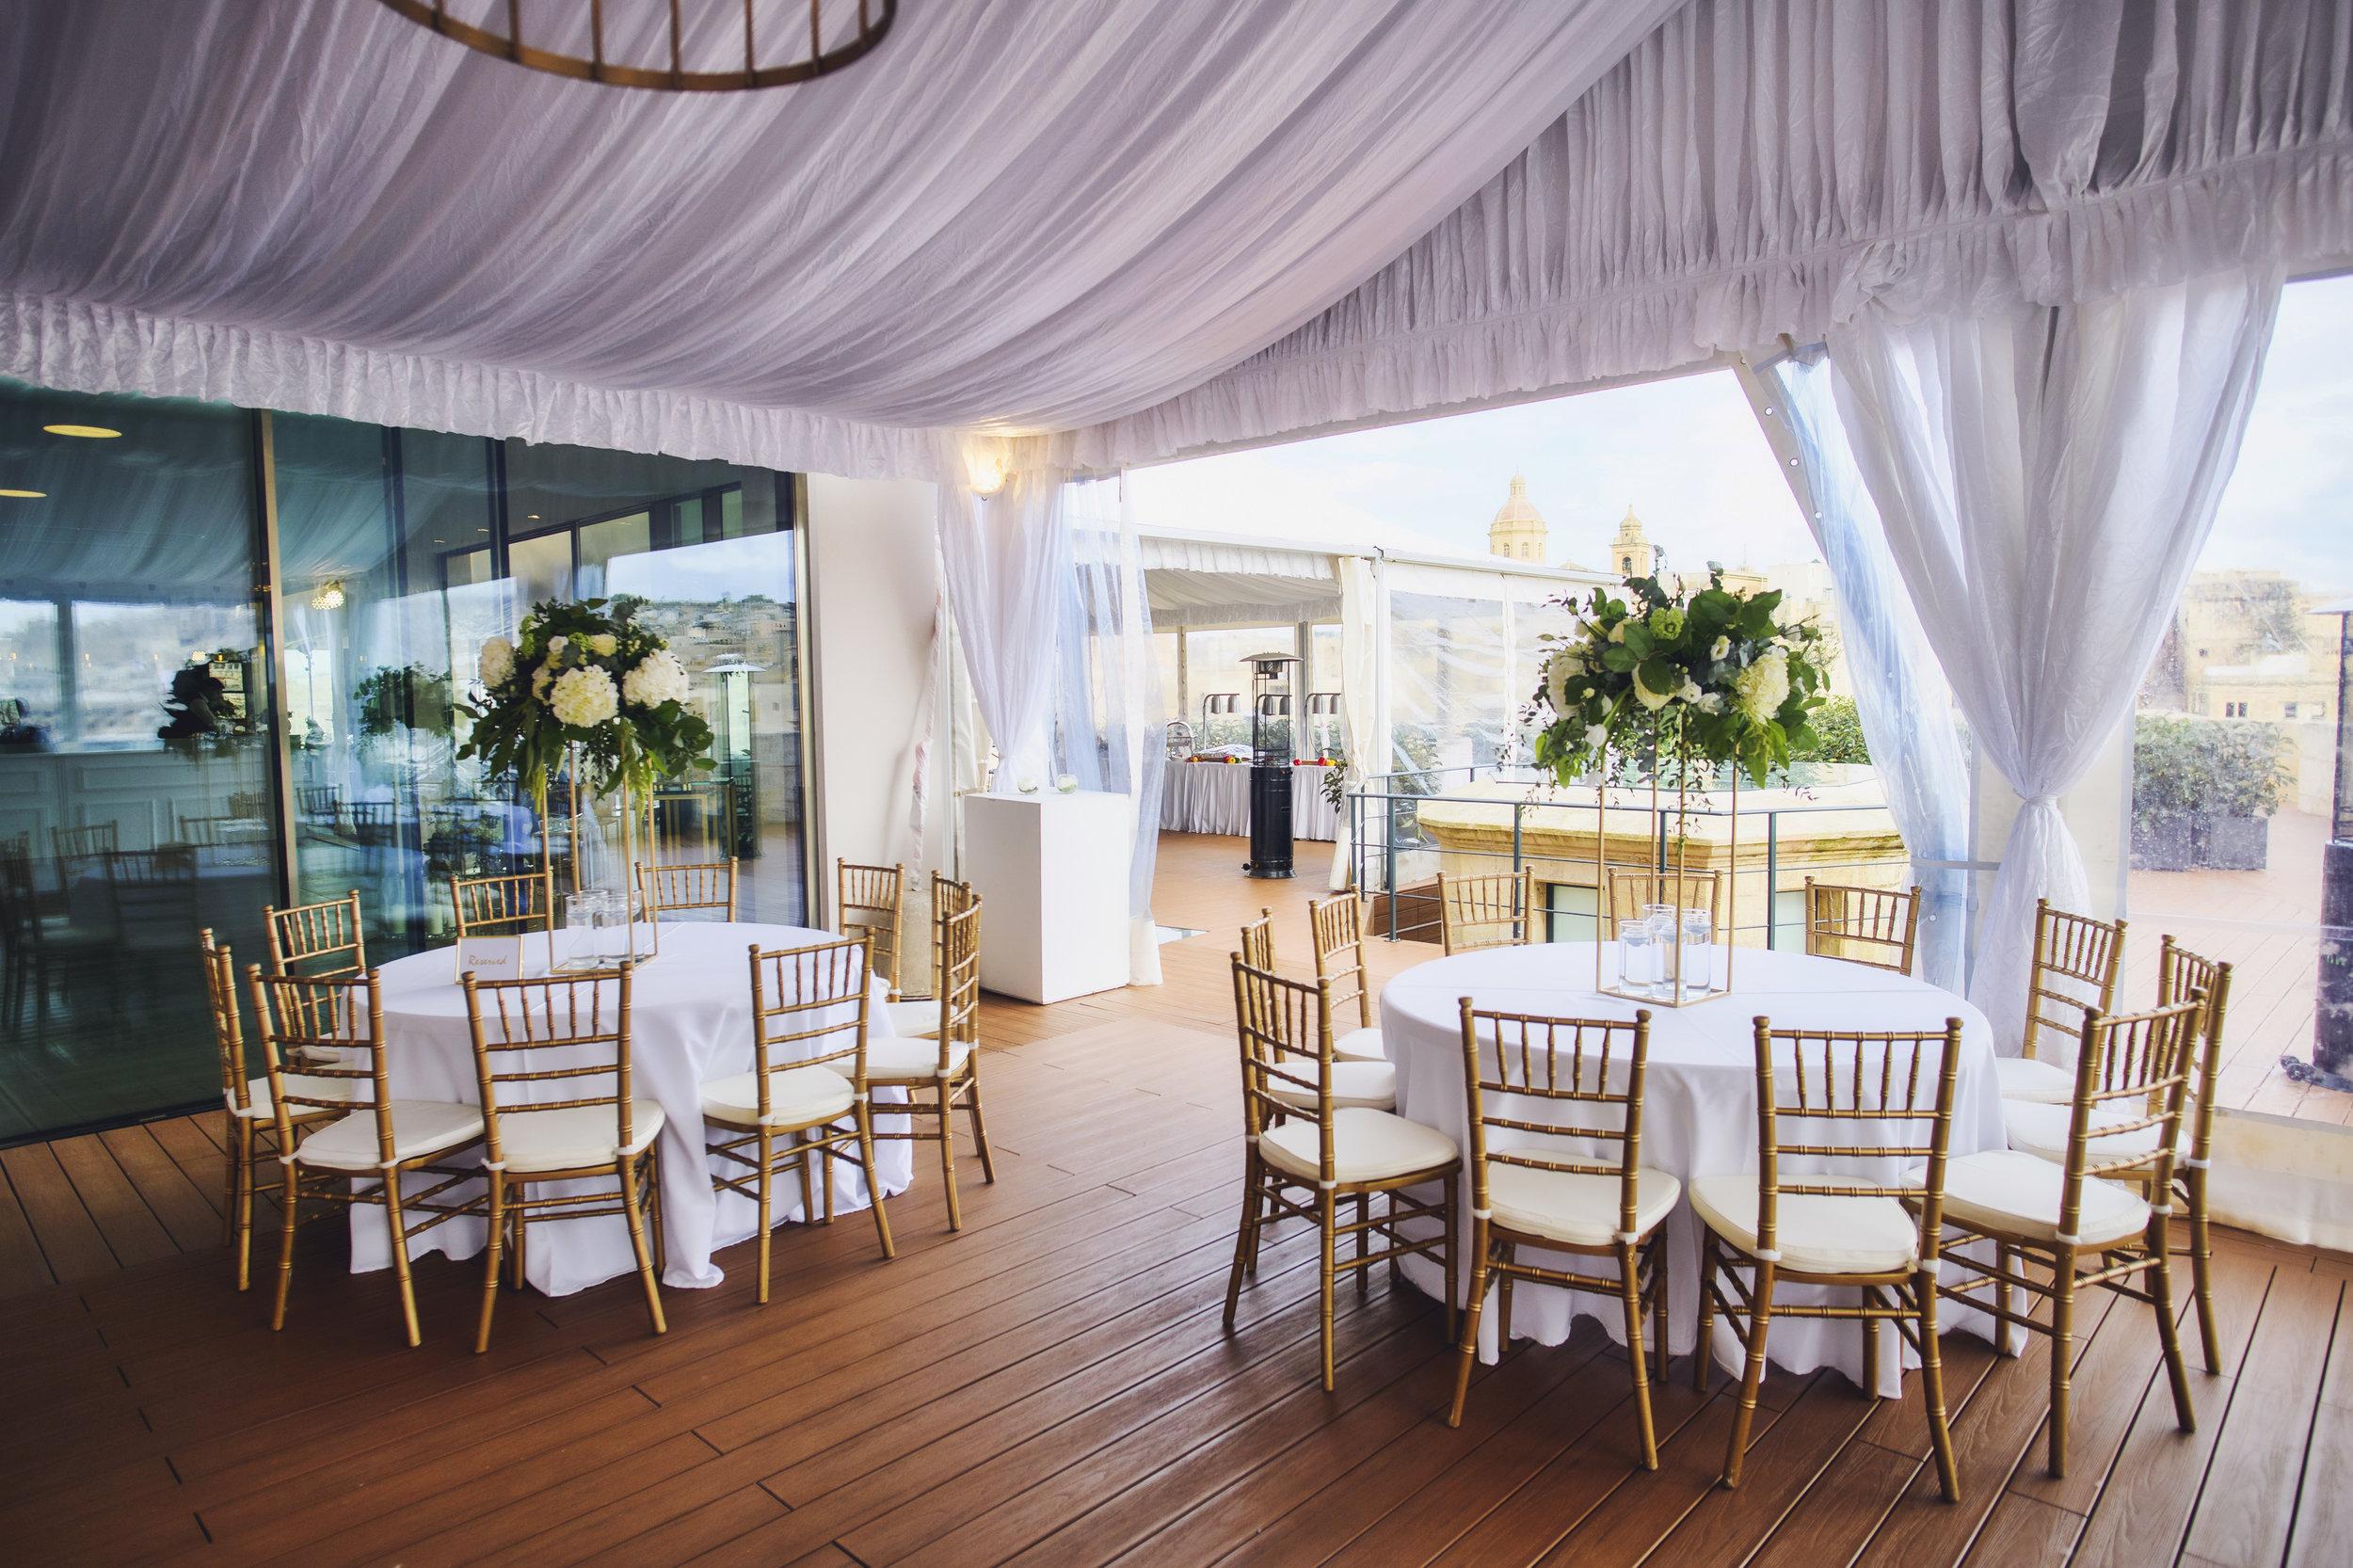 Hammet's_Wedding Venue-Bastion021217 032.jpg